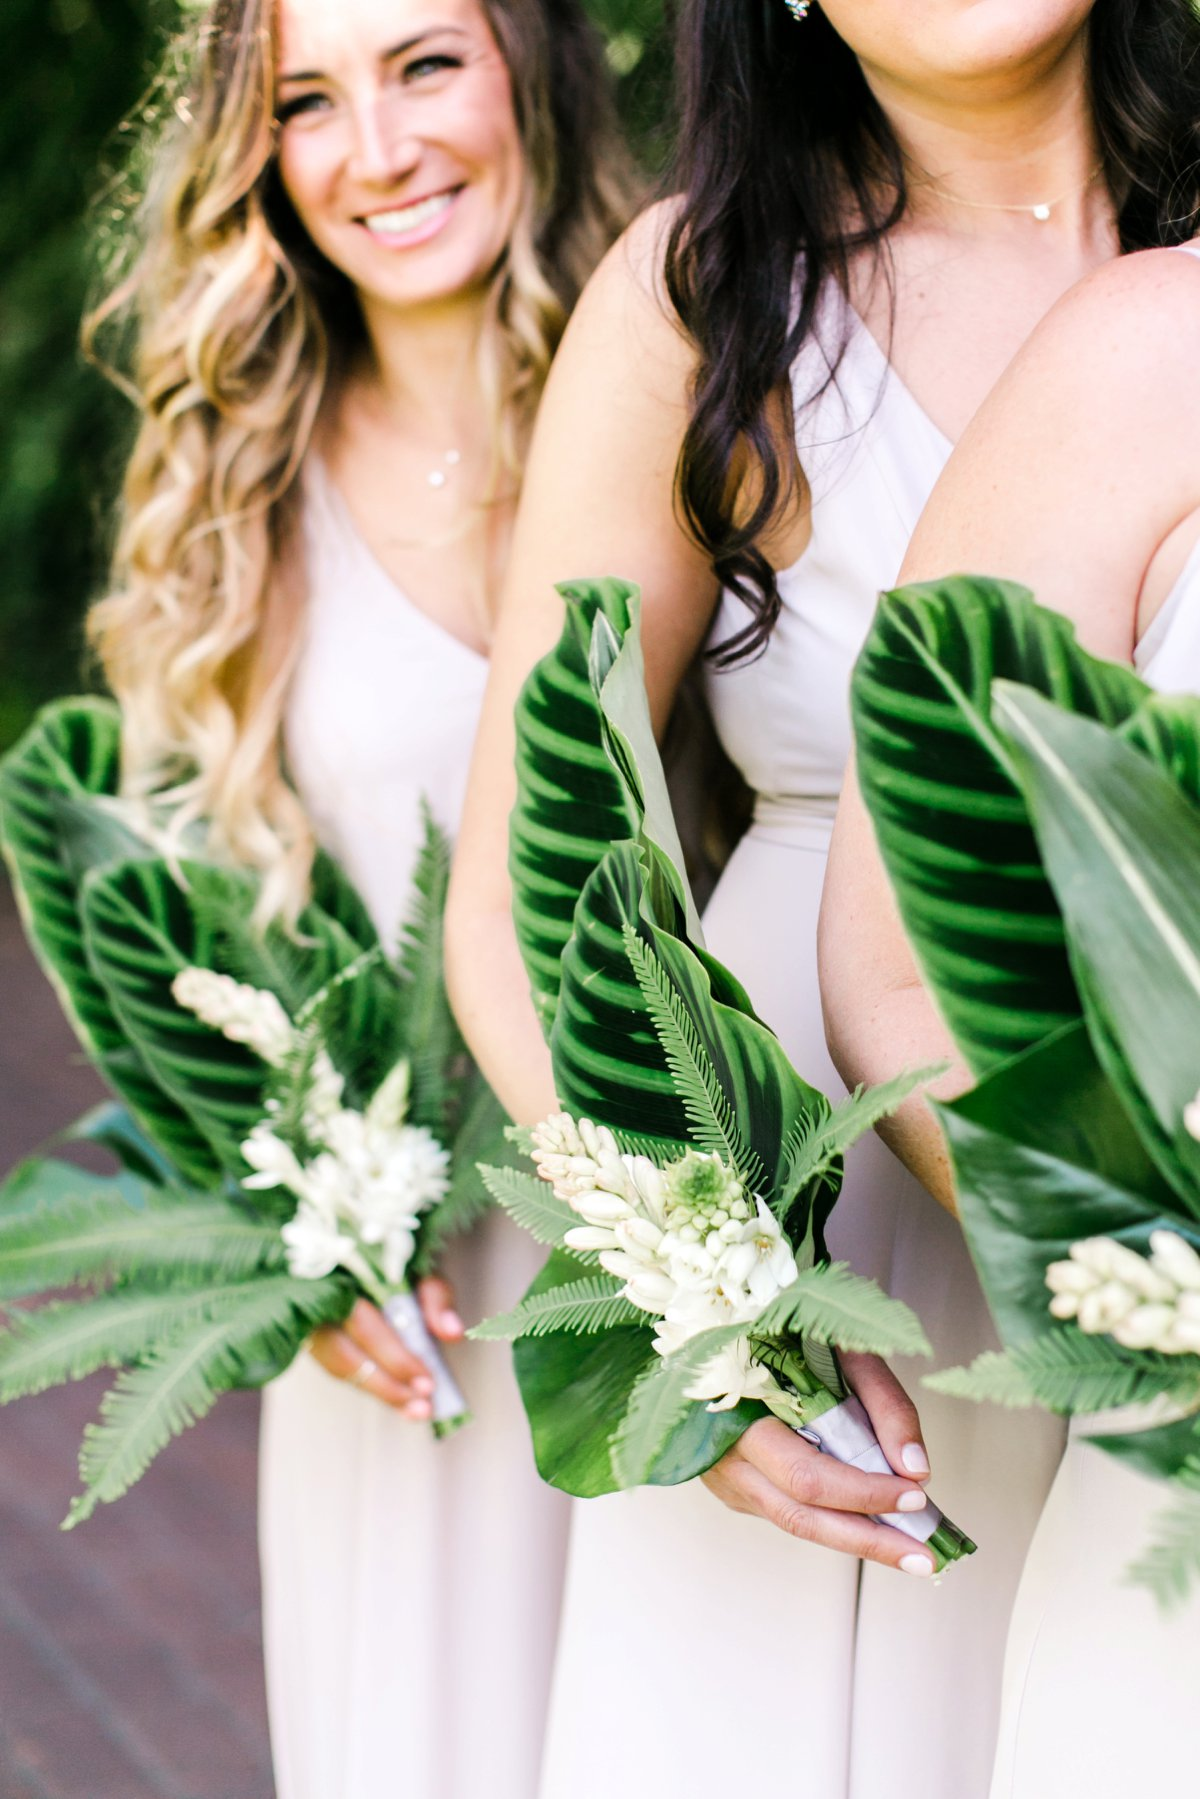 tropical bridesmaid bouquets - photo by Anna Delores http://ruffledblog.com/chic-modern-wedding-at-four-seasons-santa-barbara